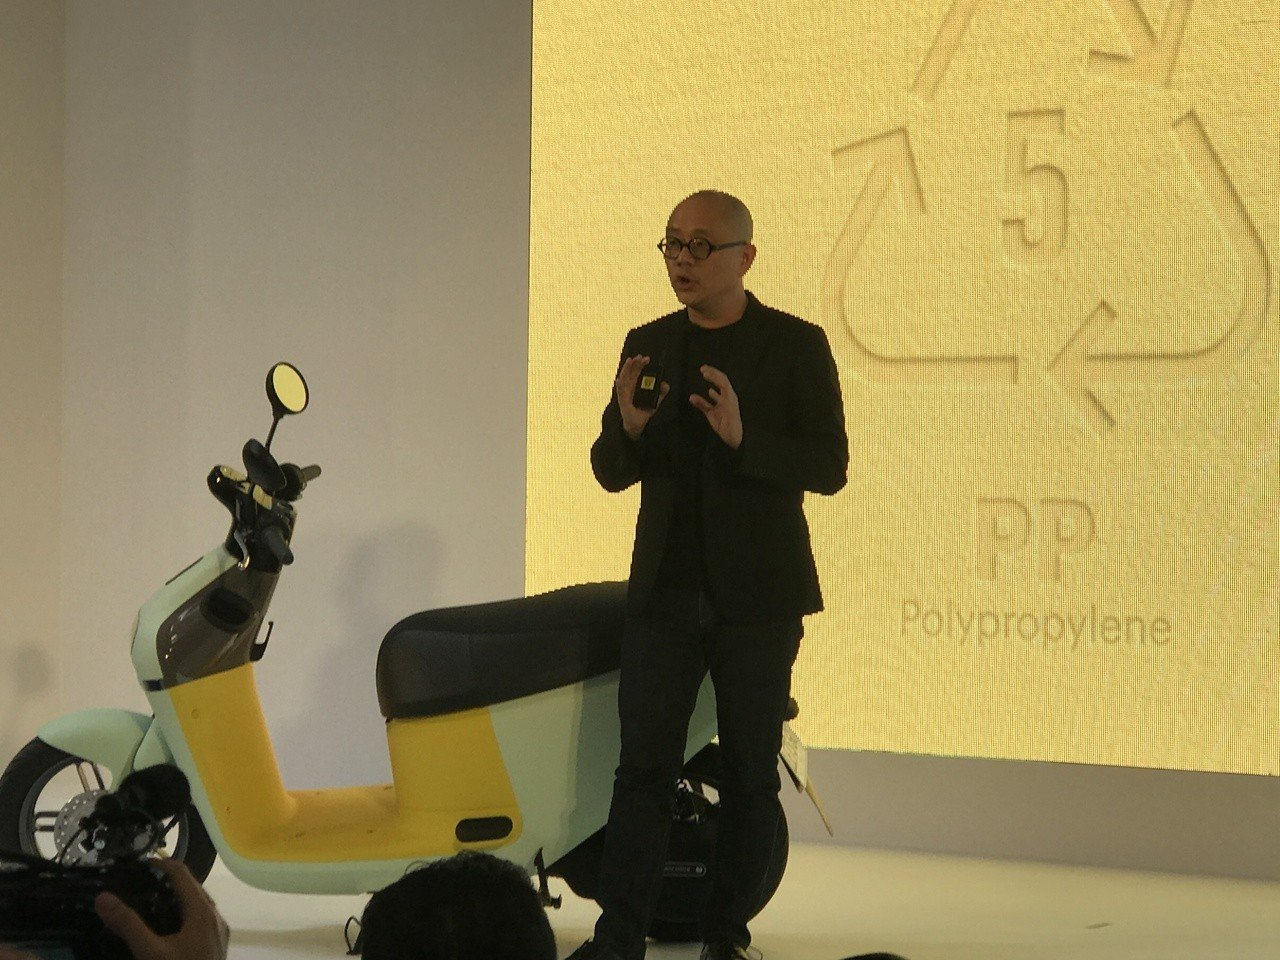 Gogoro於今(8)日發表 Gogoro 3 系列 Smartscooter®...